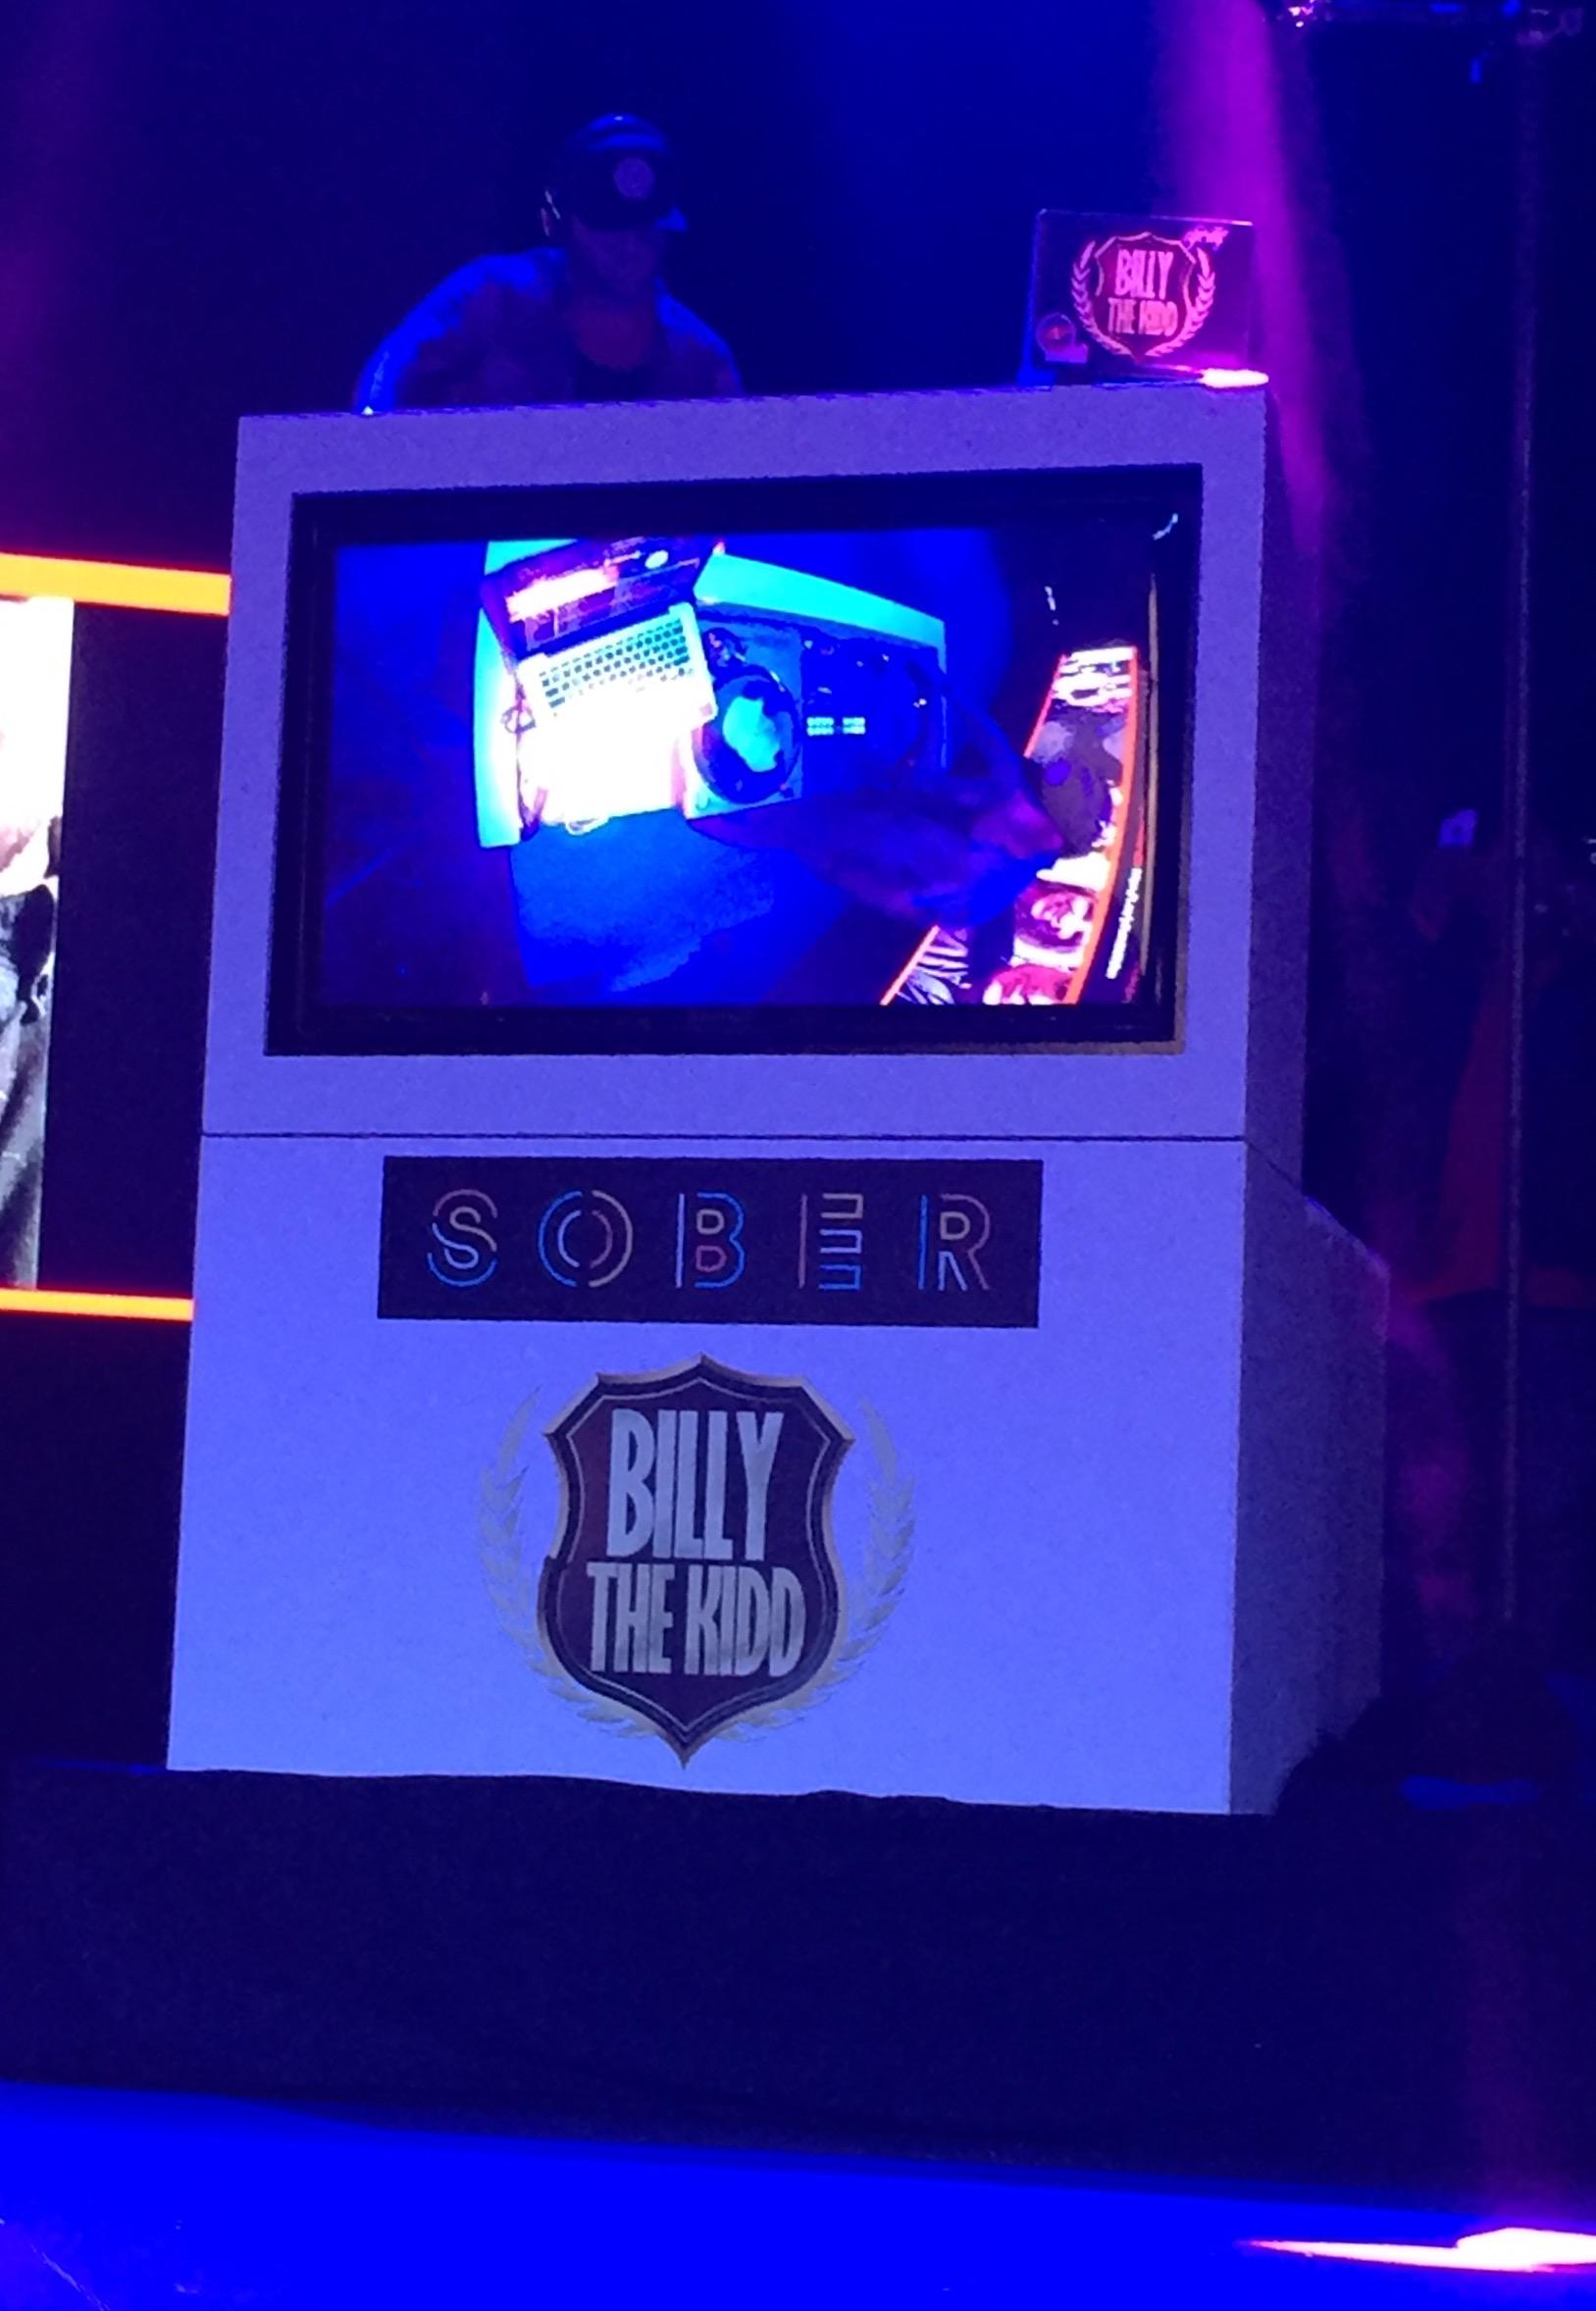 custom-dj-booth-tv-television-display-custom-logo-beyond-lighting-audio-visual